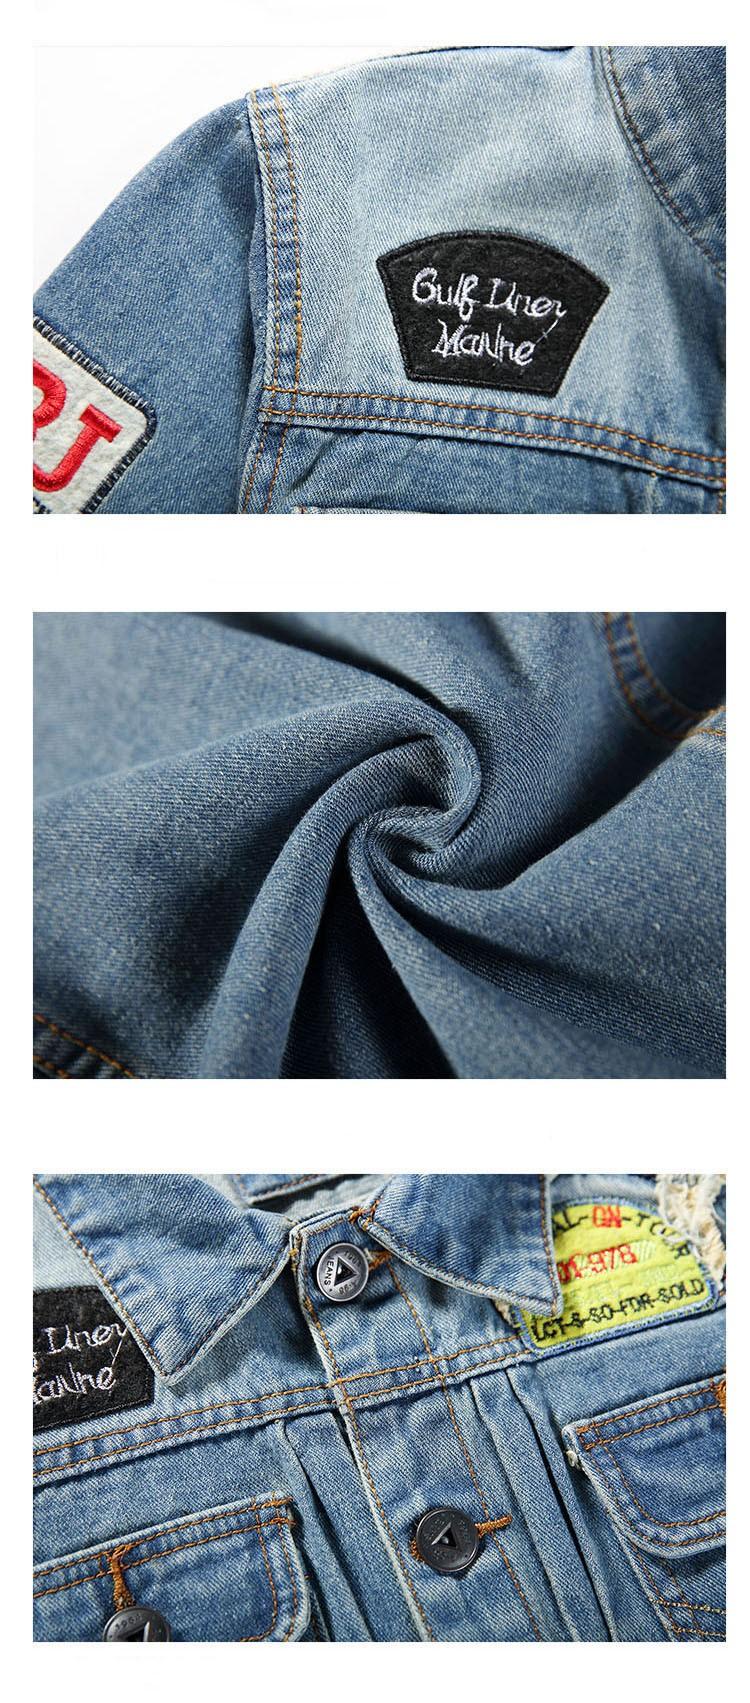 Men's Denim Jacket high quality fashion Jeans Jackets Slim fit casual streetwear Vintage Mens jean clothing Plus Size M-5XL (12)